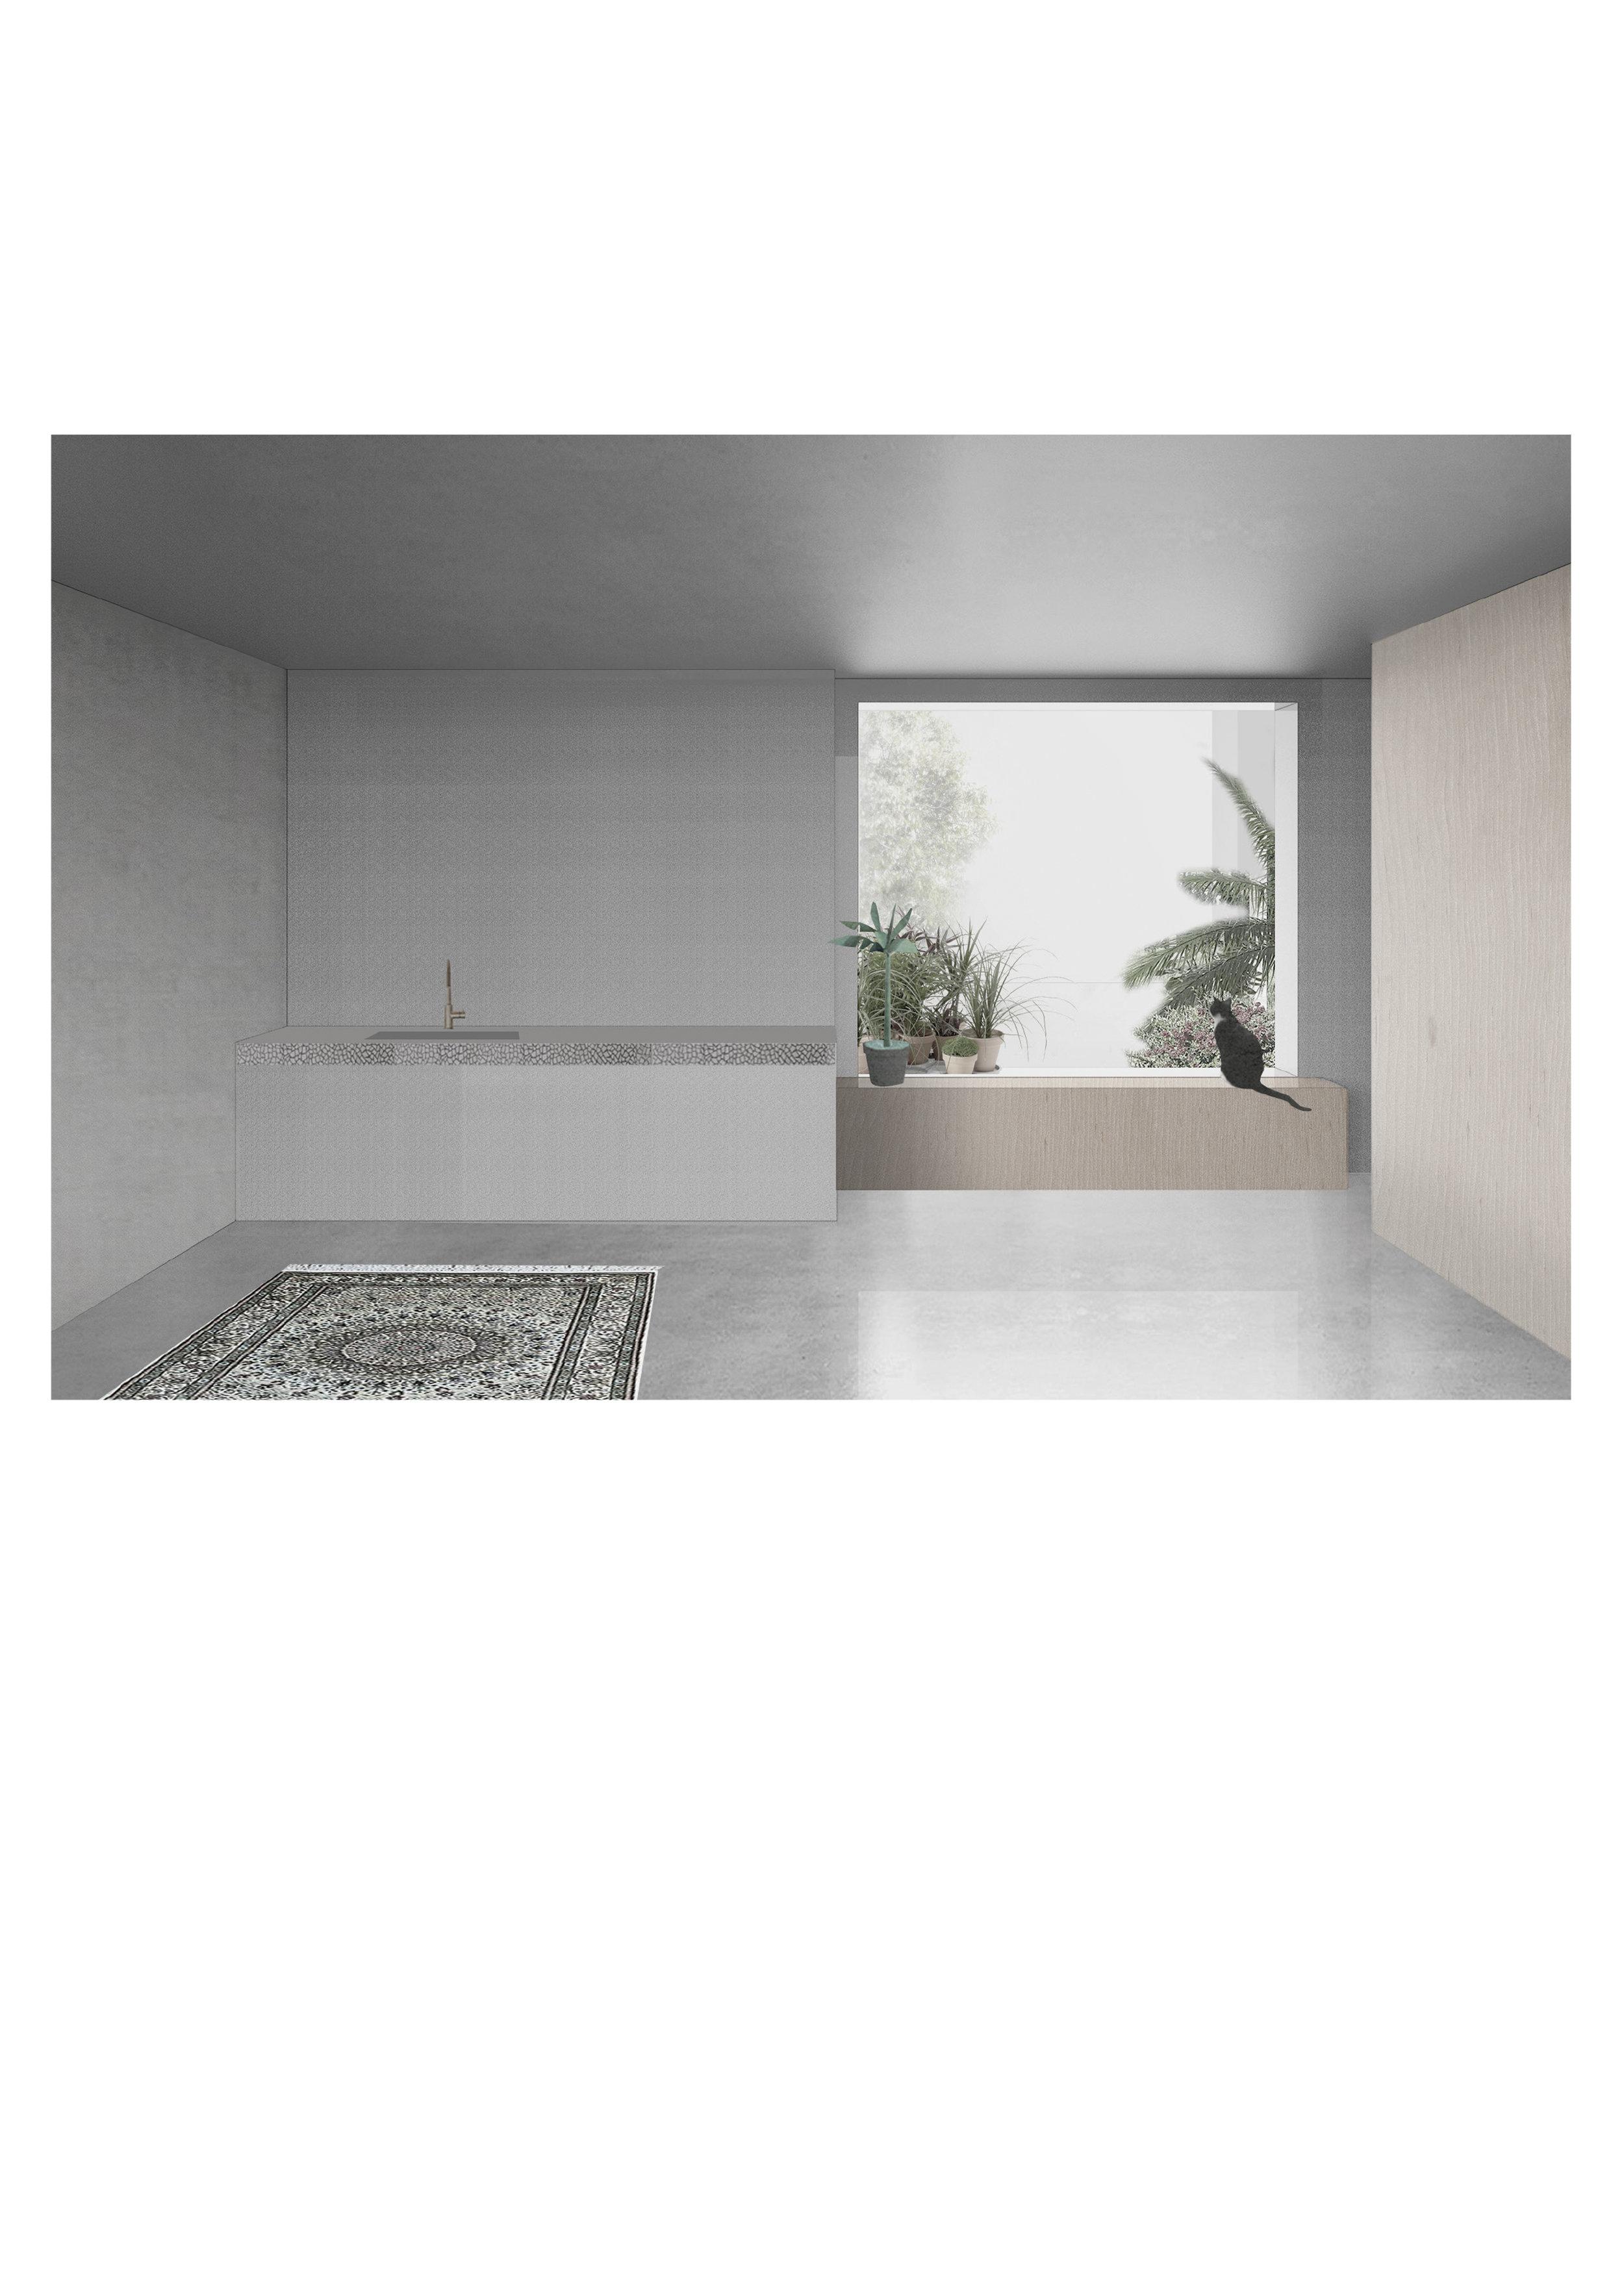 UPB_CLT_HOUSING_2.jpg